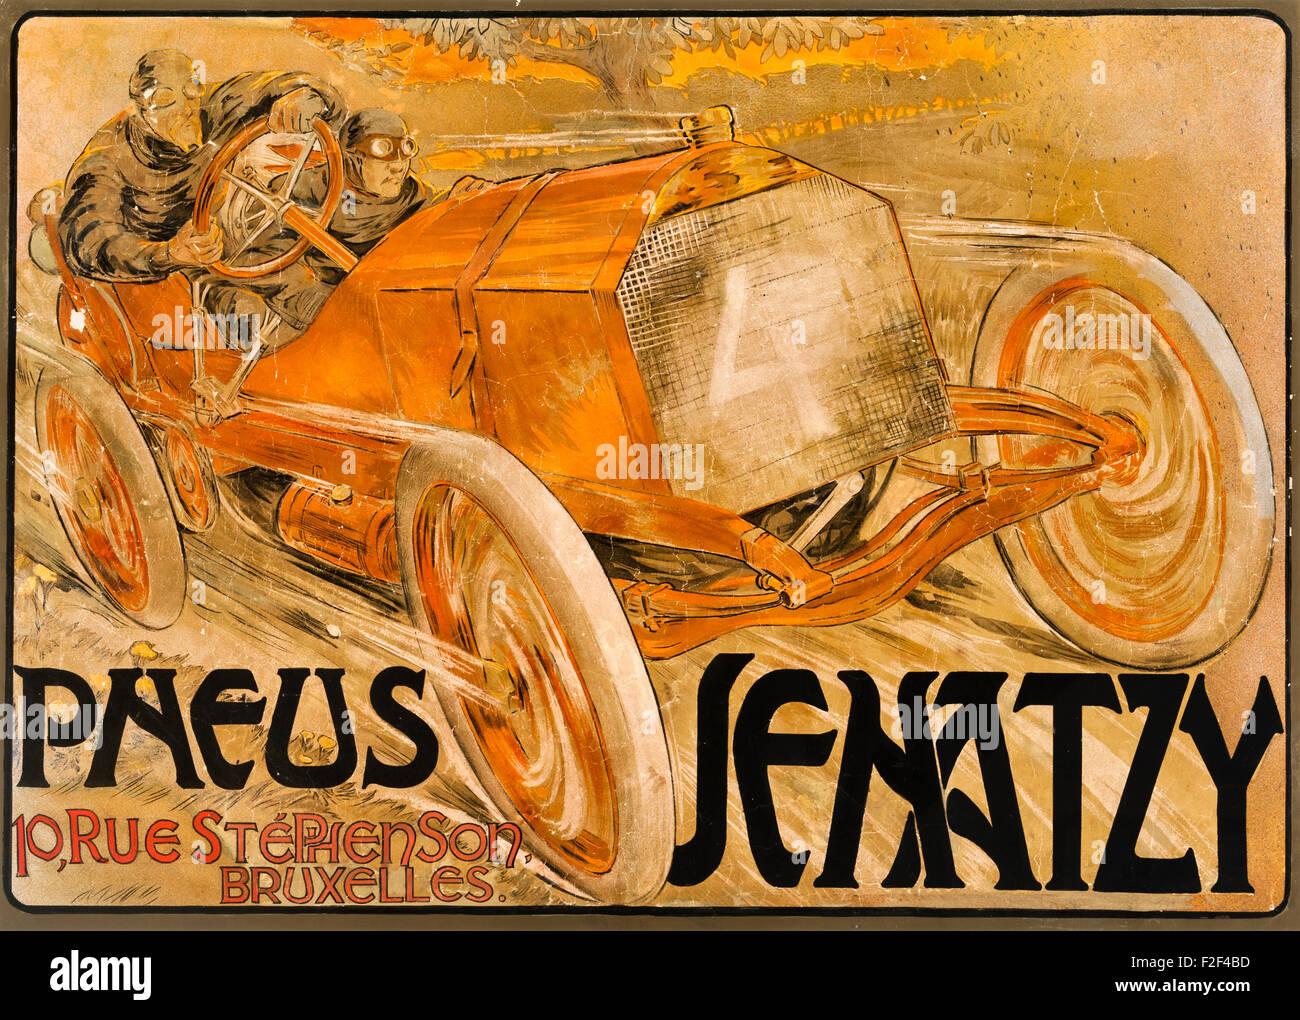 1906 Pneus Senatzy automobile racing poster by Georges Gaudy, advertising Senatzy car tyres - Stock Image